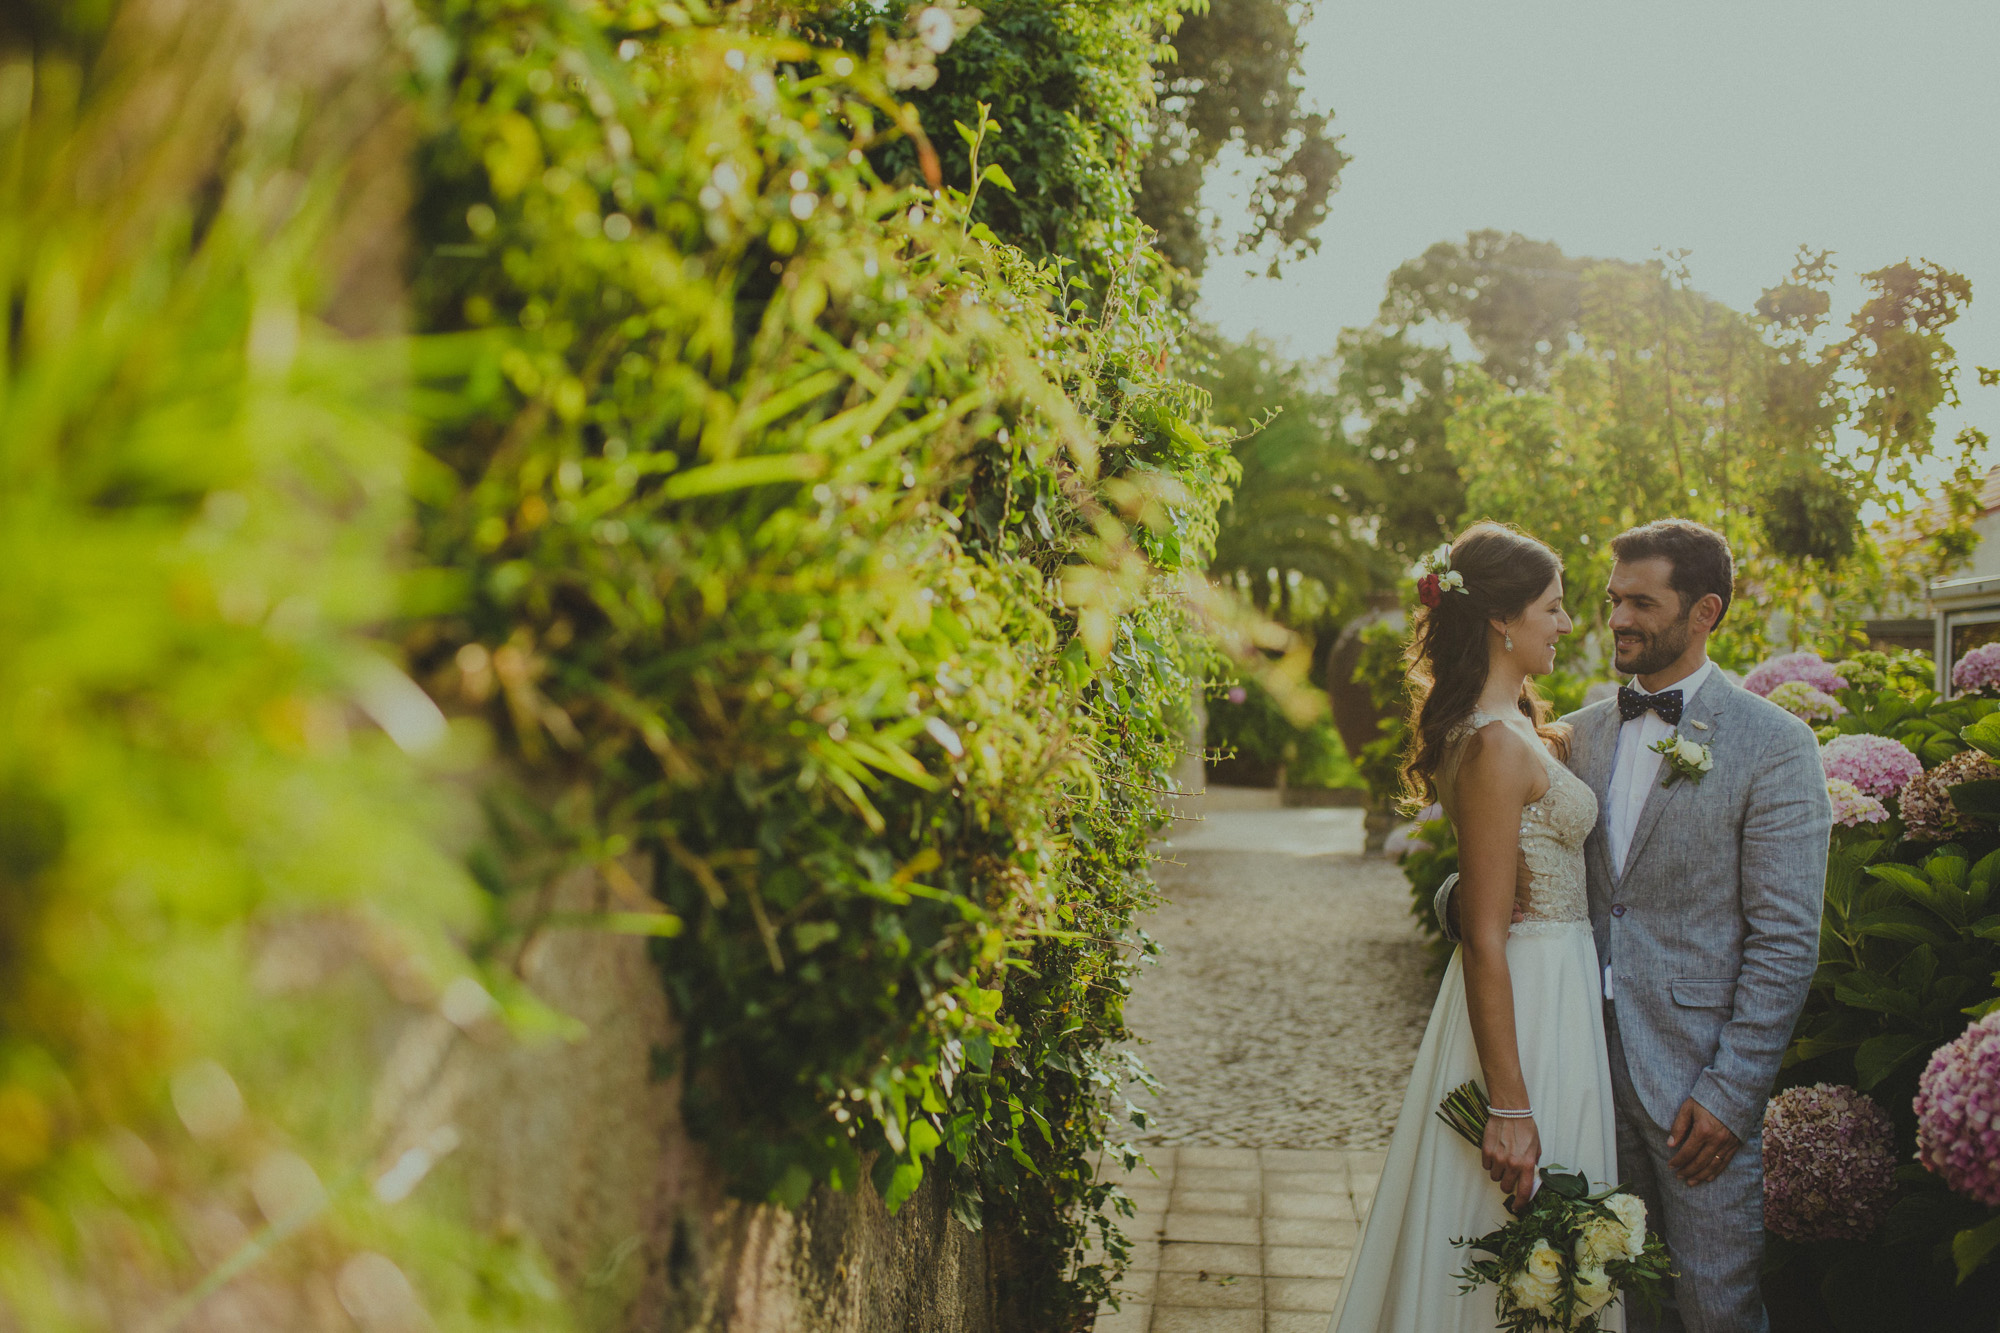 040-carina-e-samuel-wedding-casamento-quinta-dos-rouxinois-rustico-my-fancy-wedding-mafra-malveira-lisboa-sintra-cascais-filipe-santiago-fotografia-fotografo-lifestyle-destination-portugal